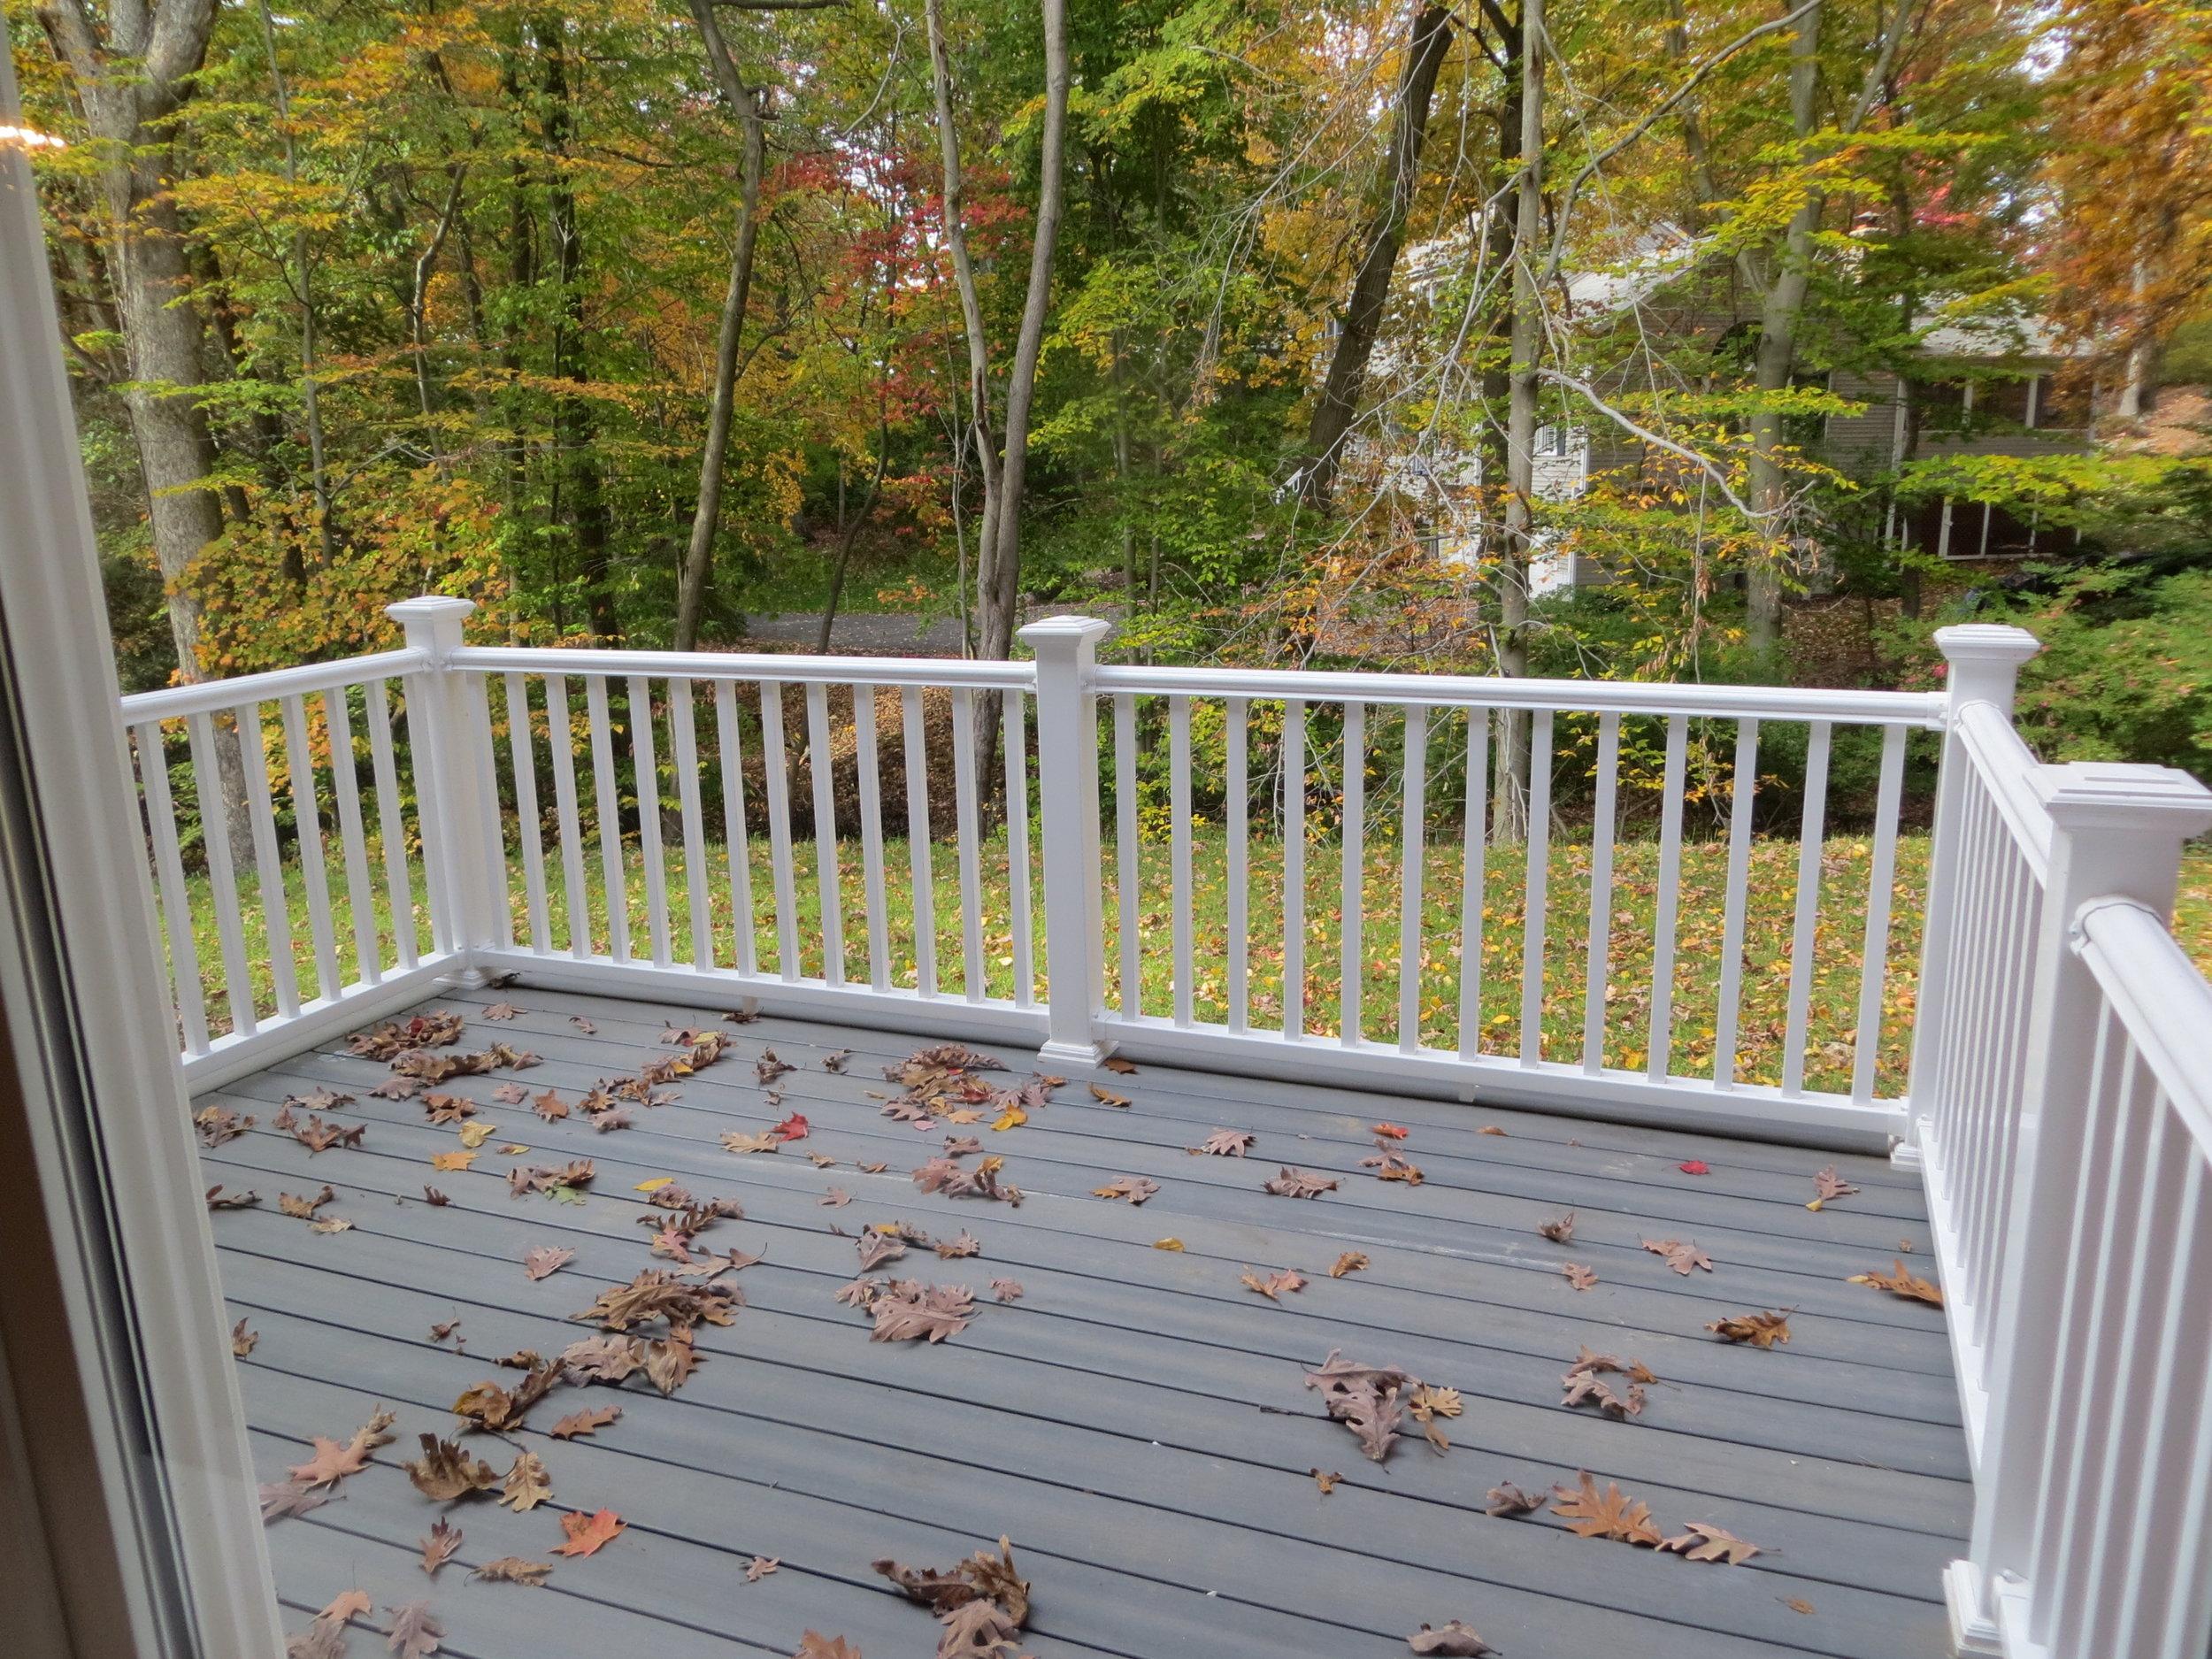 2014 10 31st Carl's House & Yard (5).JPG